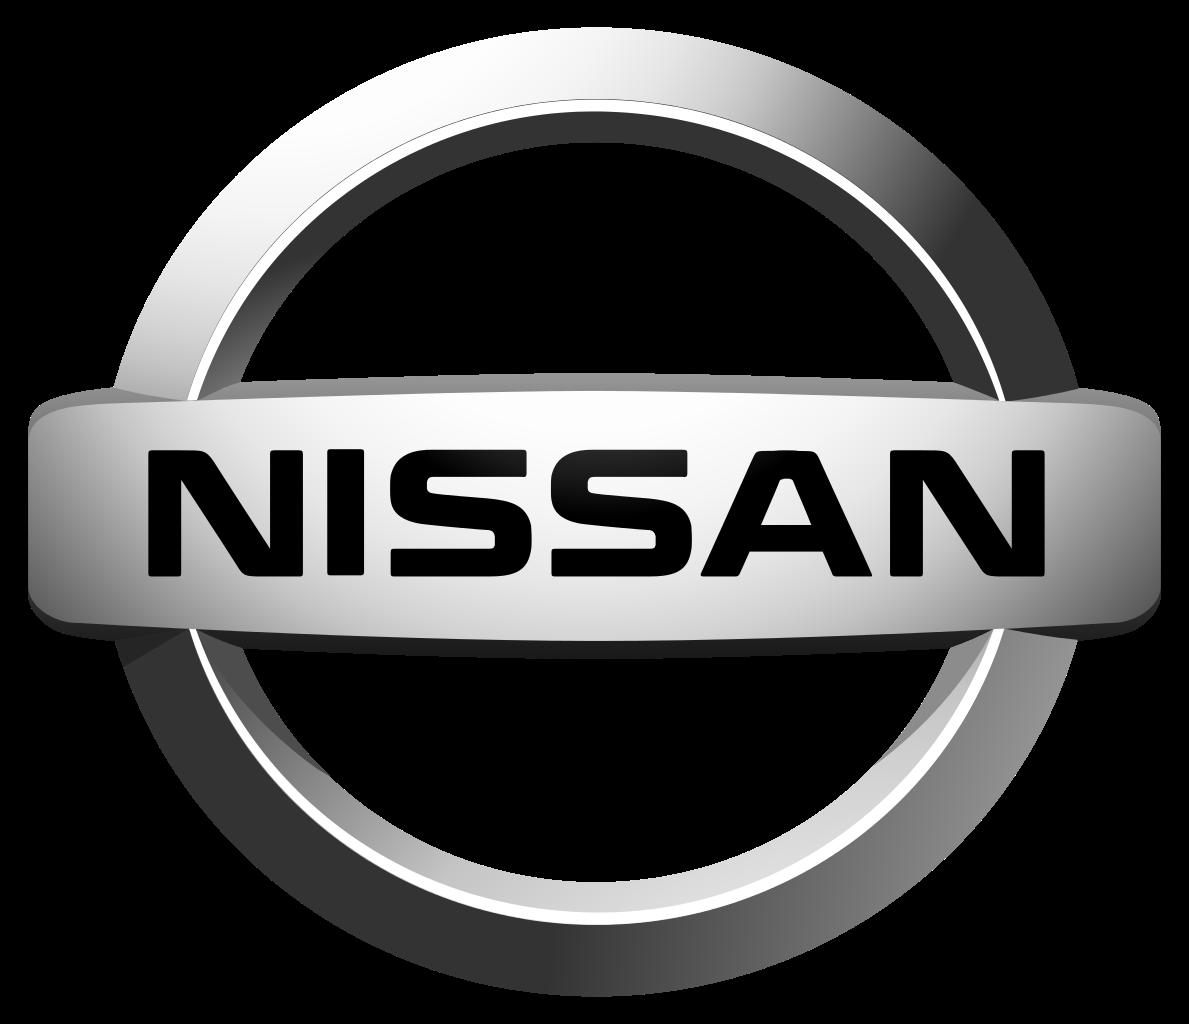 Nissan-logo.svg